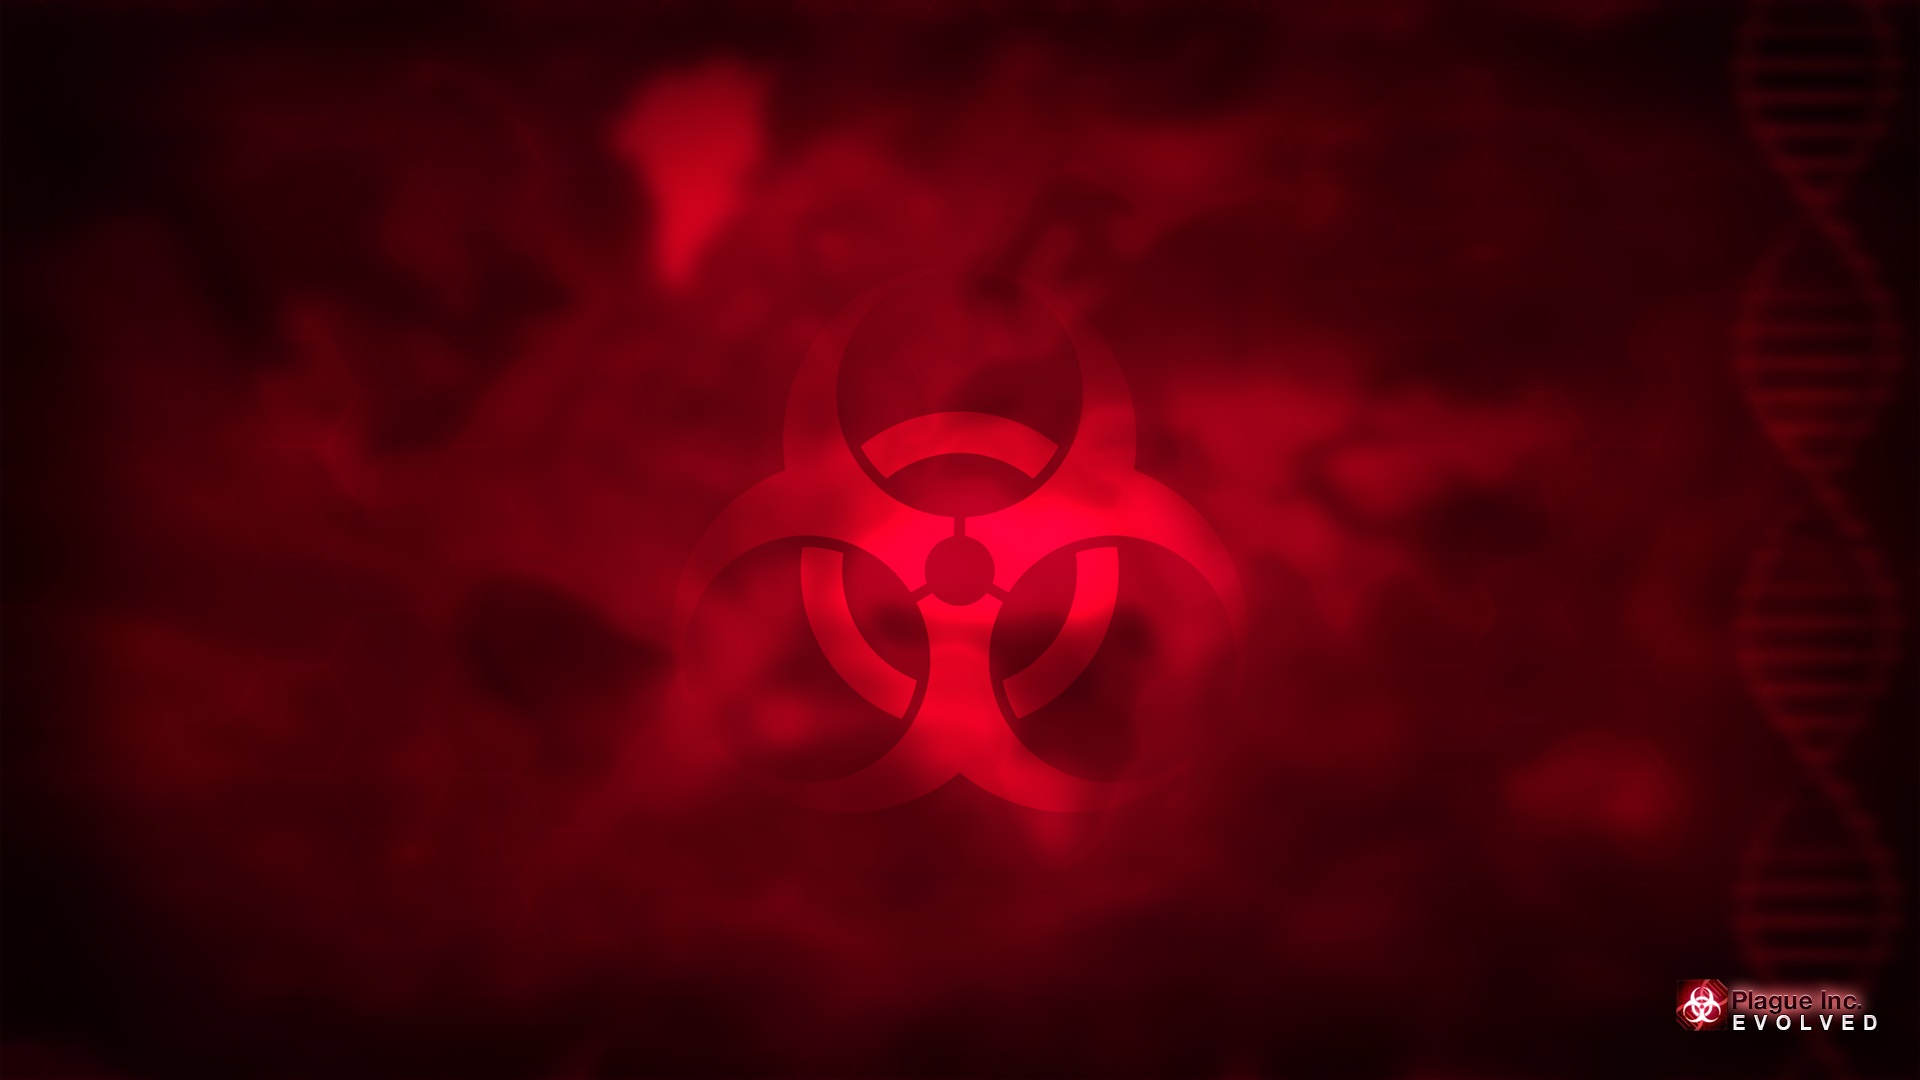 Computer Virus Hd Wallpaper Original Soundtrack And Desktop Wallpapers Now Available